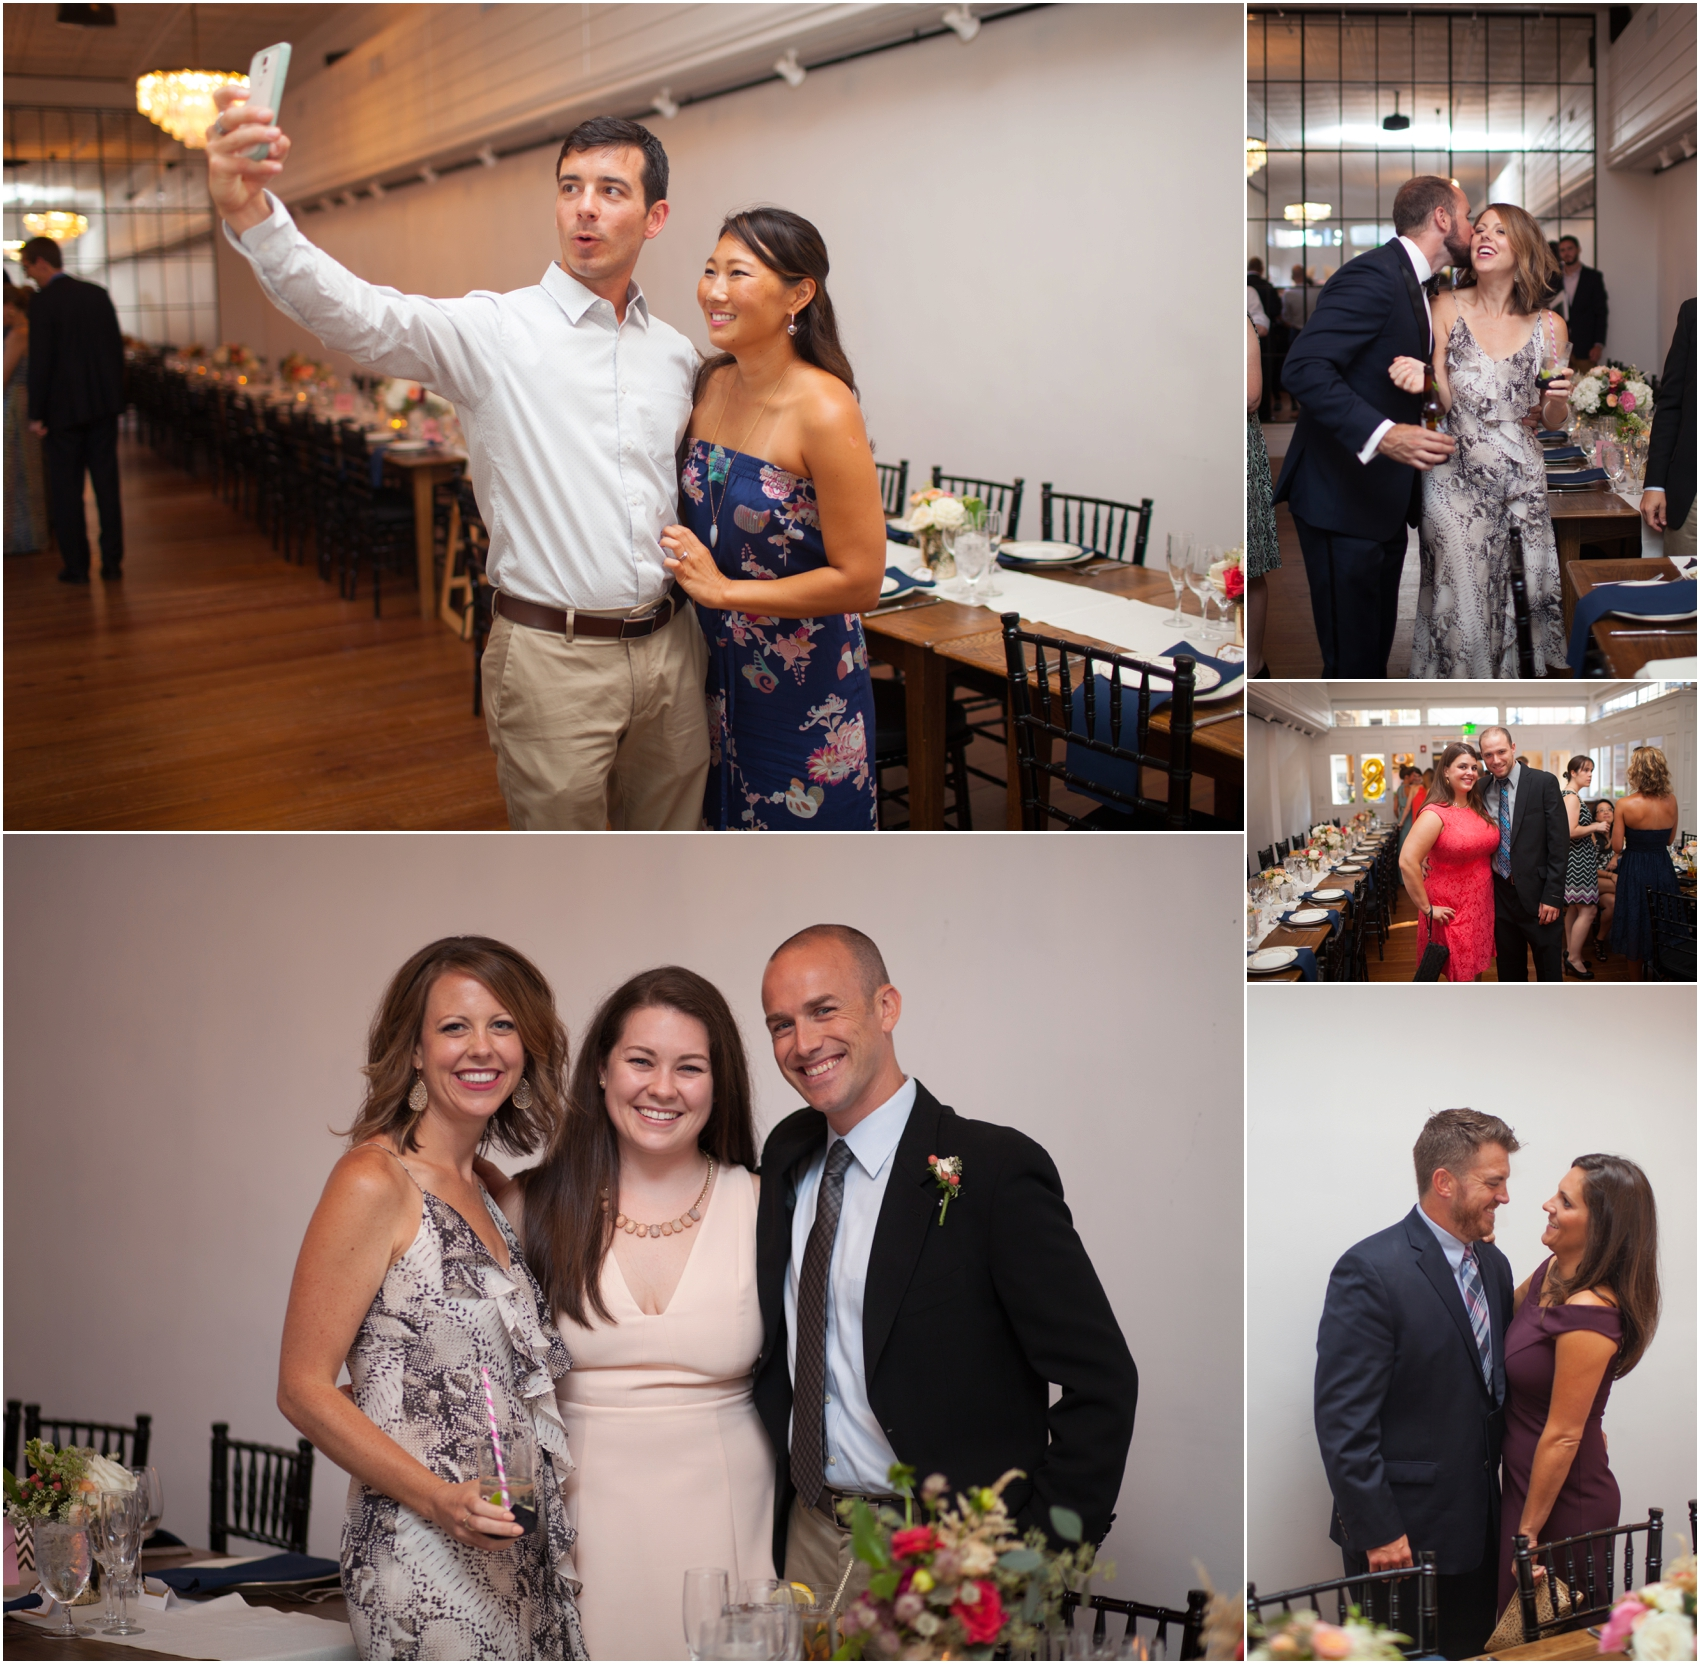 Old-Metropolitan-Hall-Wedding-Charlottesville-Virginia-2-47.jpg